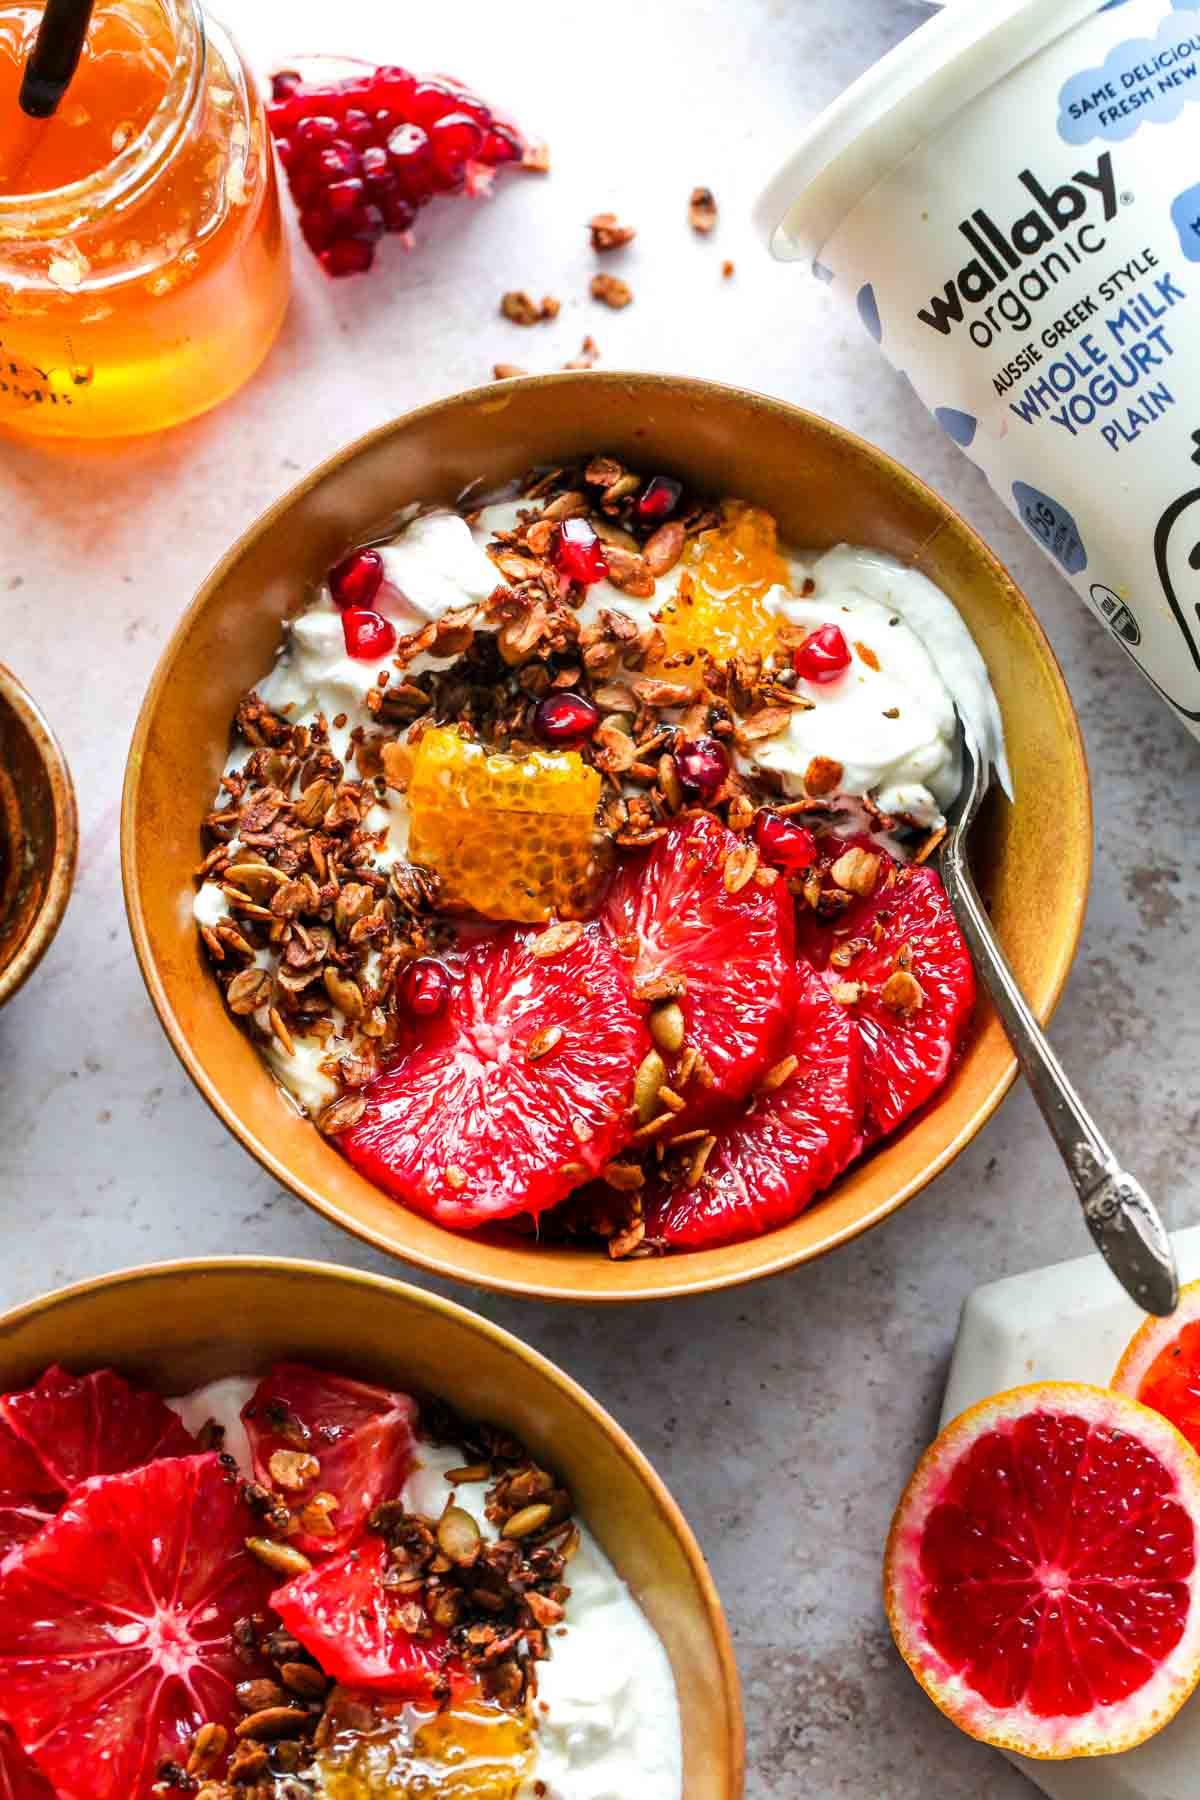 Breakfast spread including Wallaby yogurt, honey, citrus, and prepared breakfast bowls